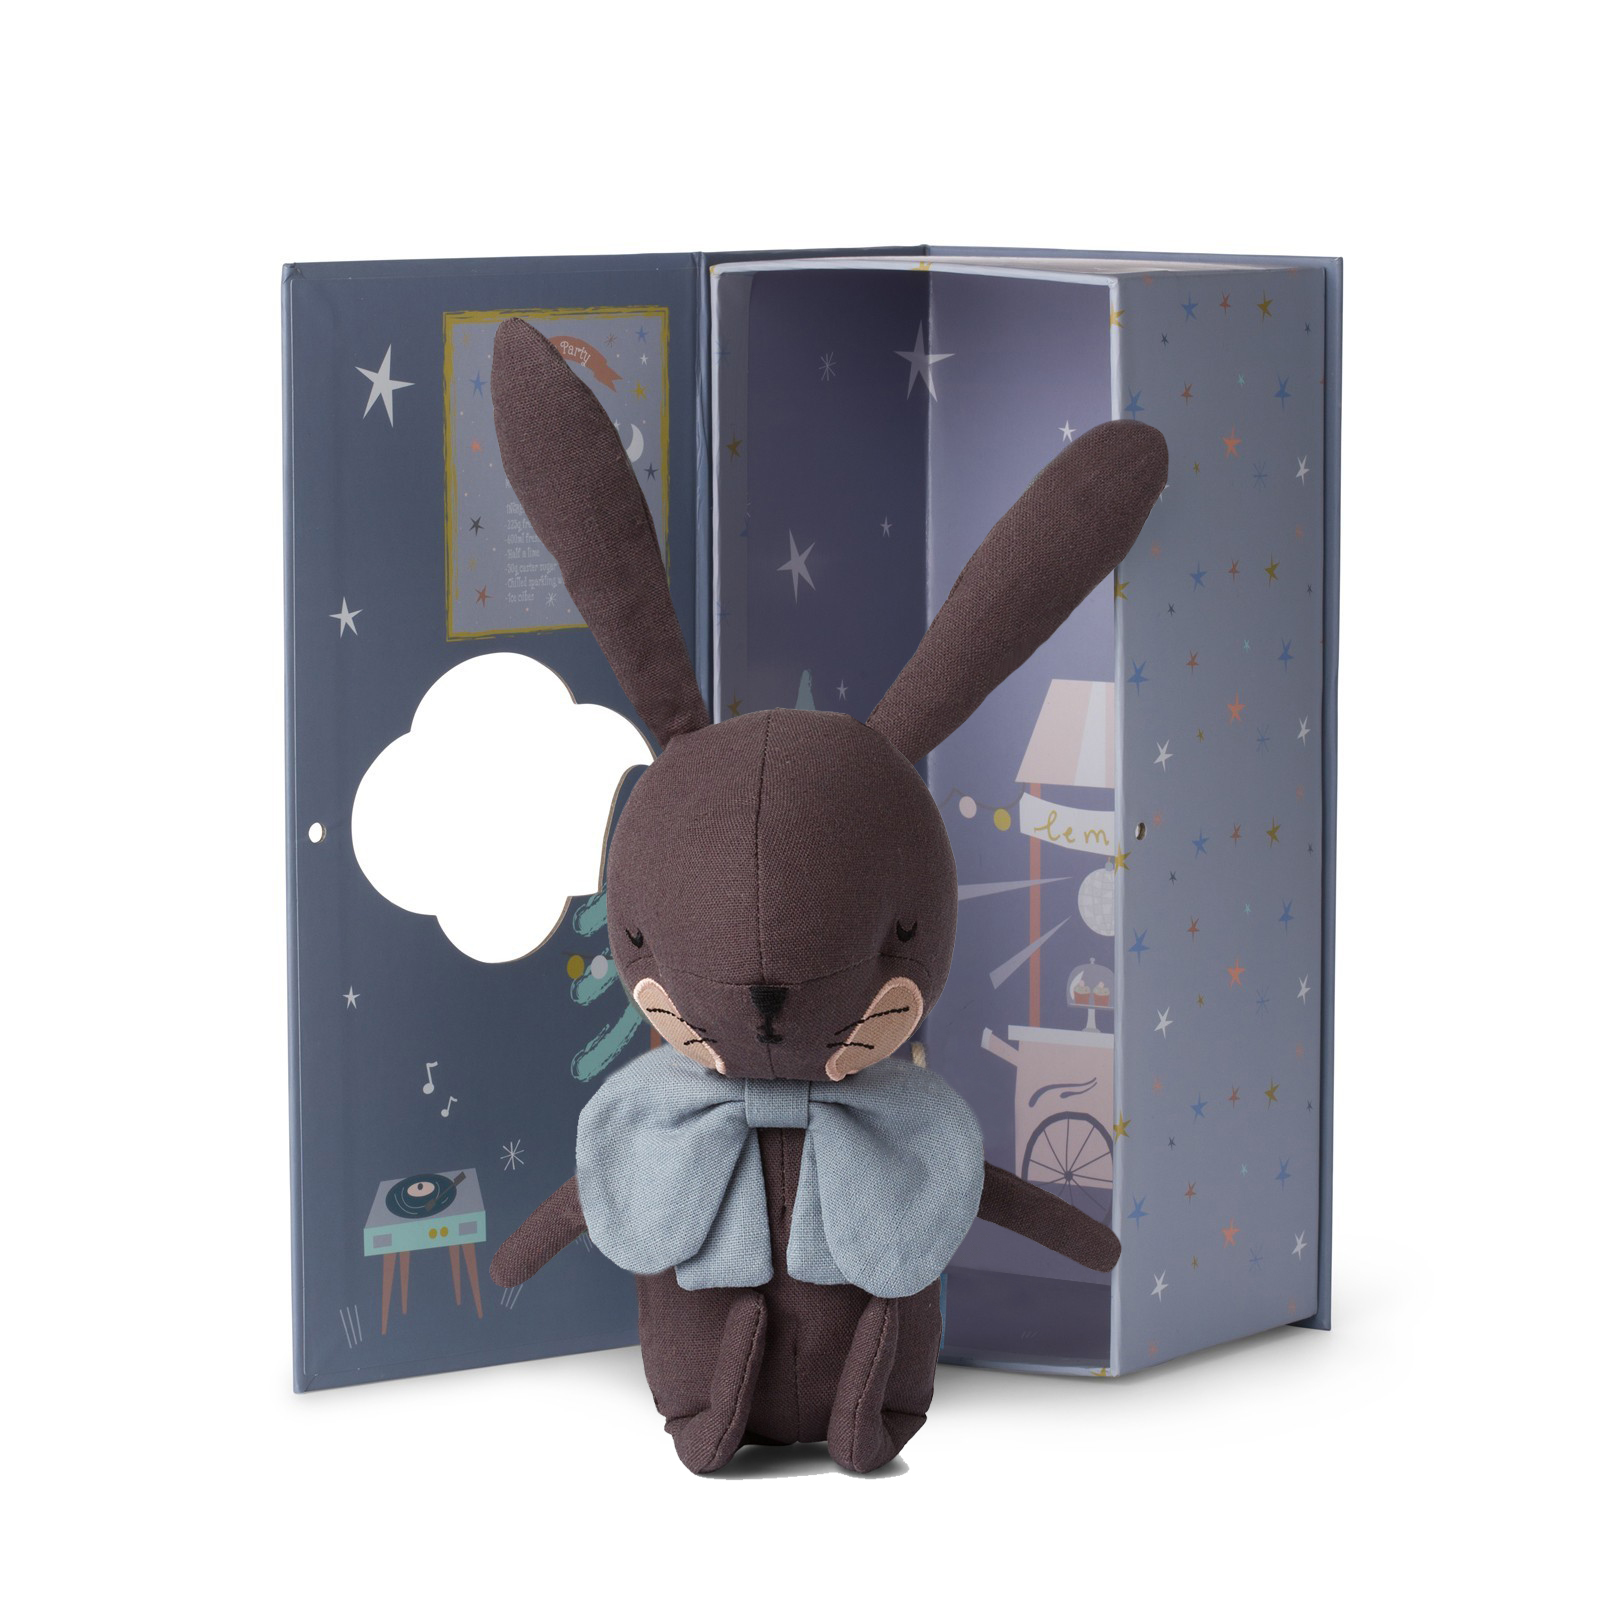 Plyšový zajačik hnedý v škatuľke - Picca Loulou (18 cm)